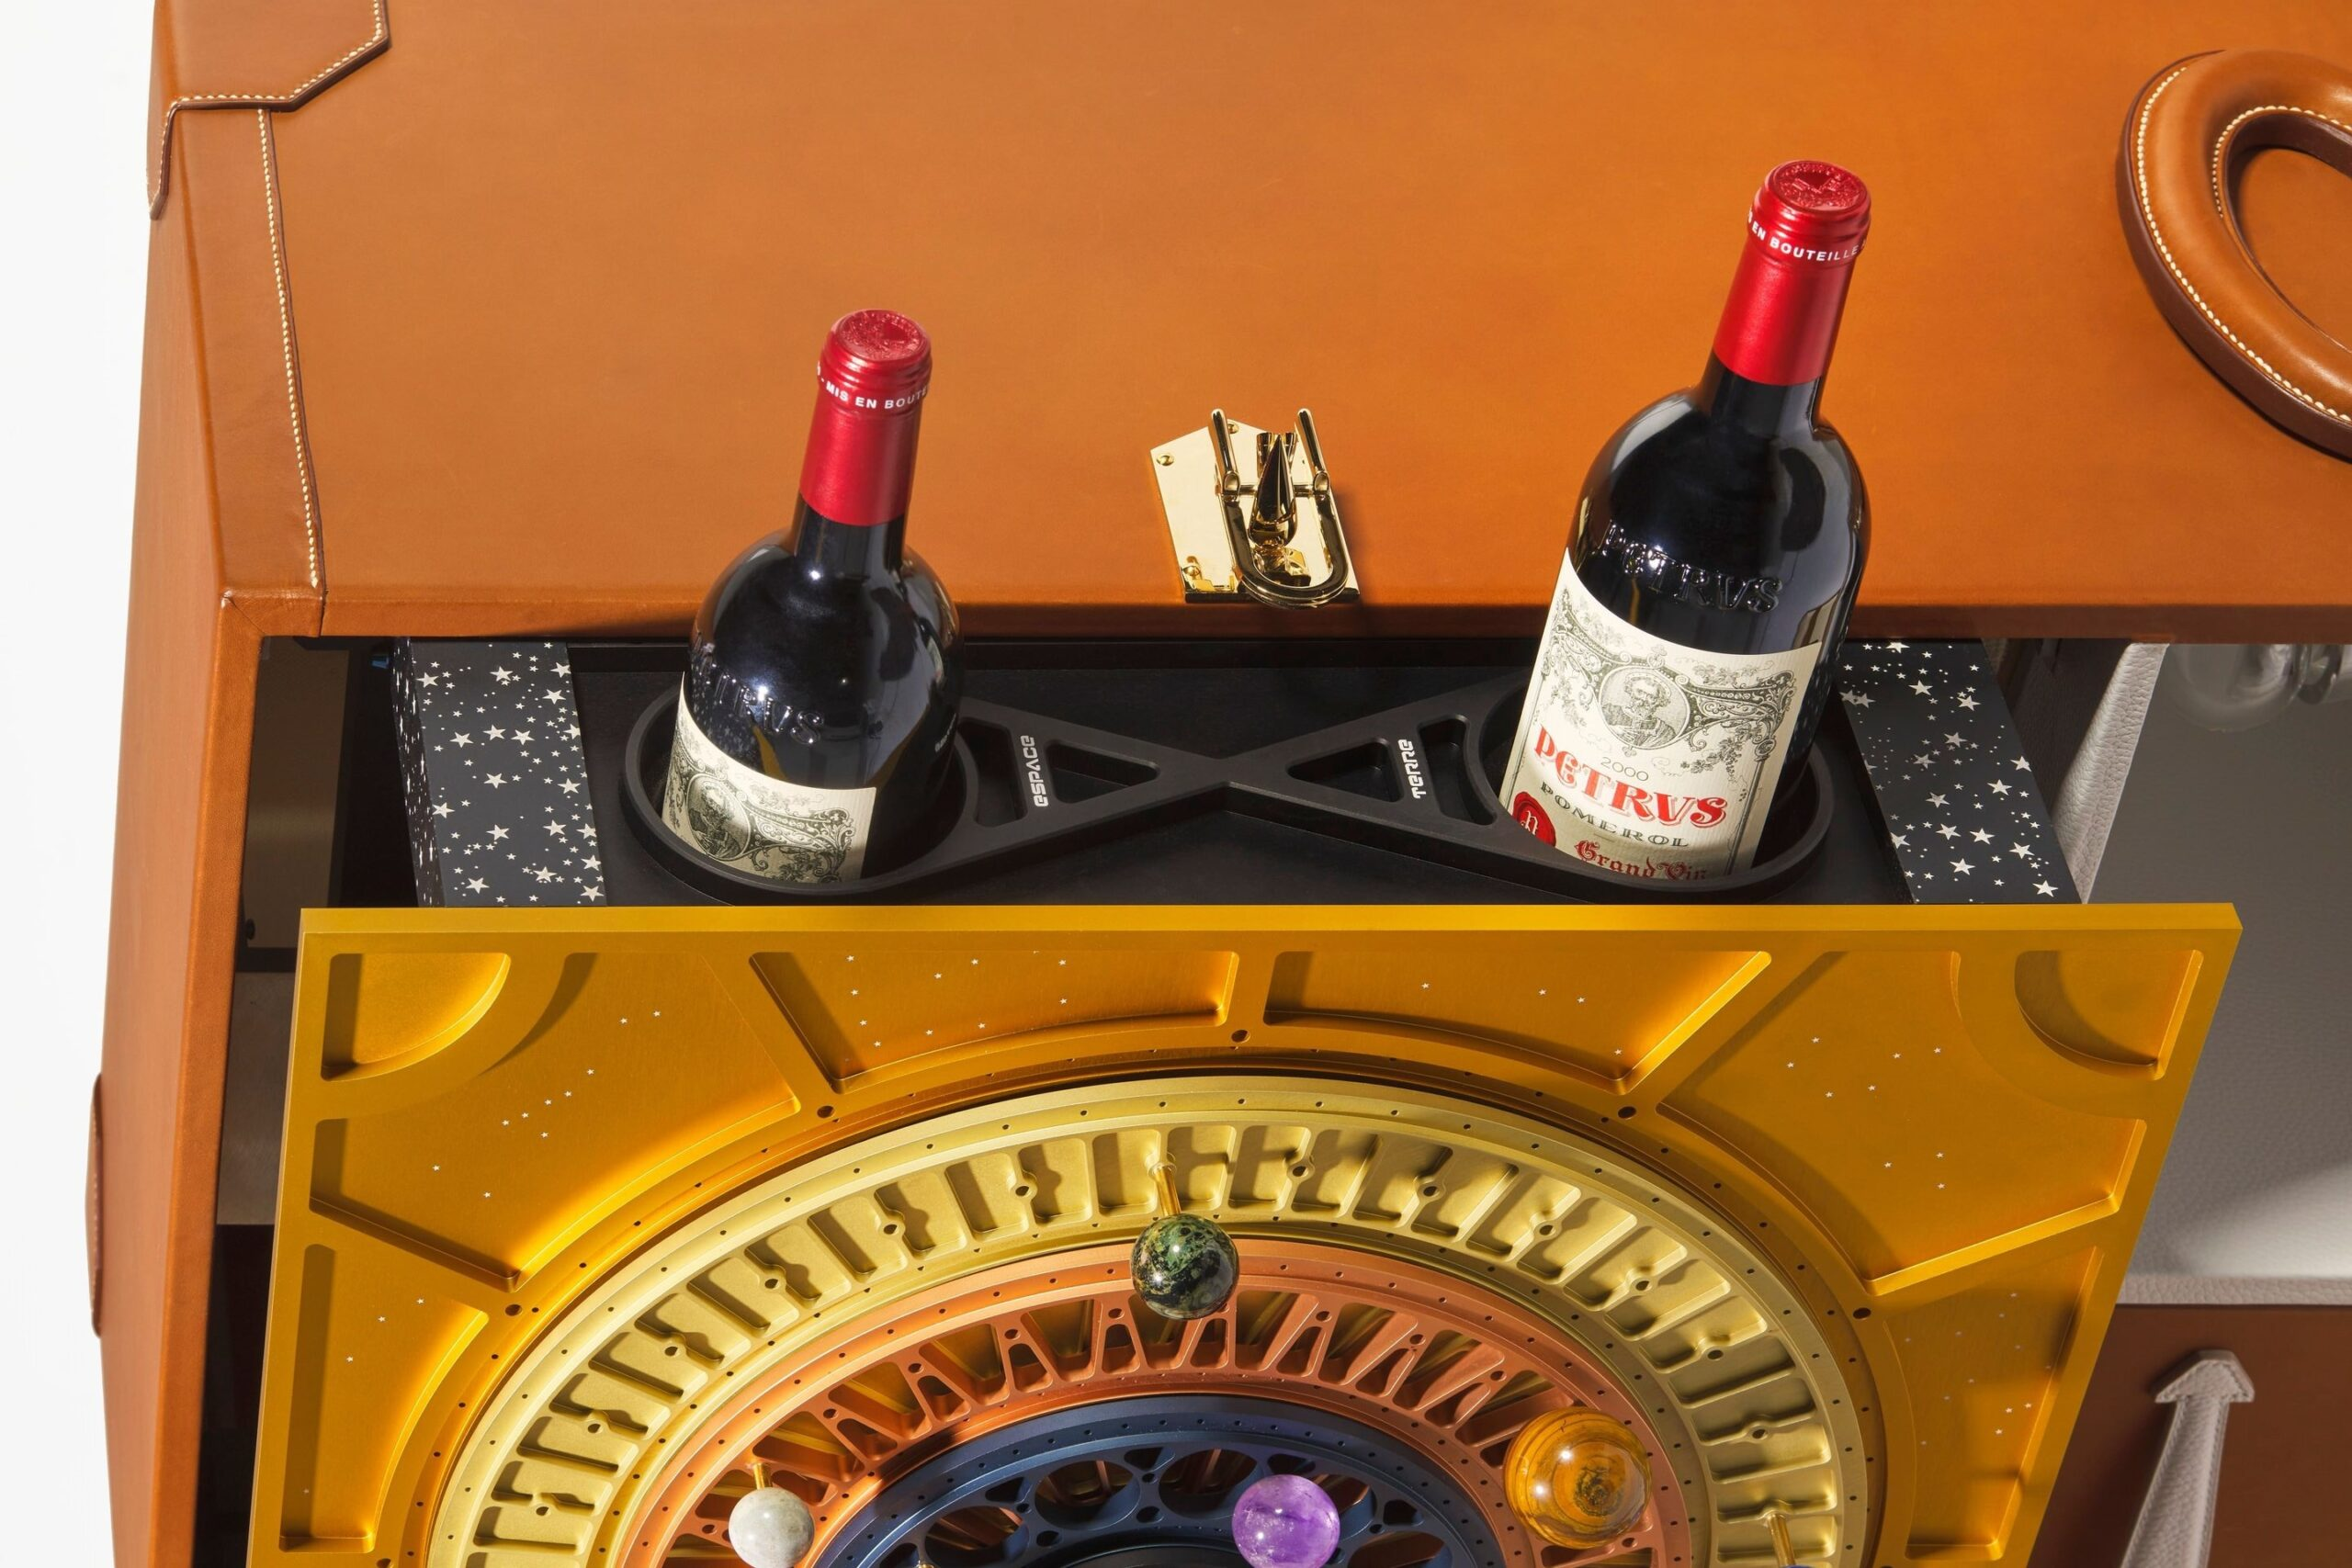 На аукционе продадут вино из космоса.Вокруг Света. Украина